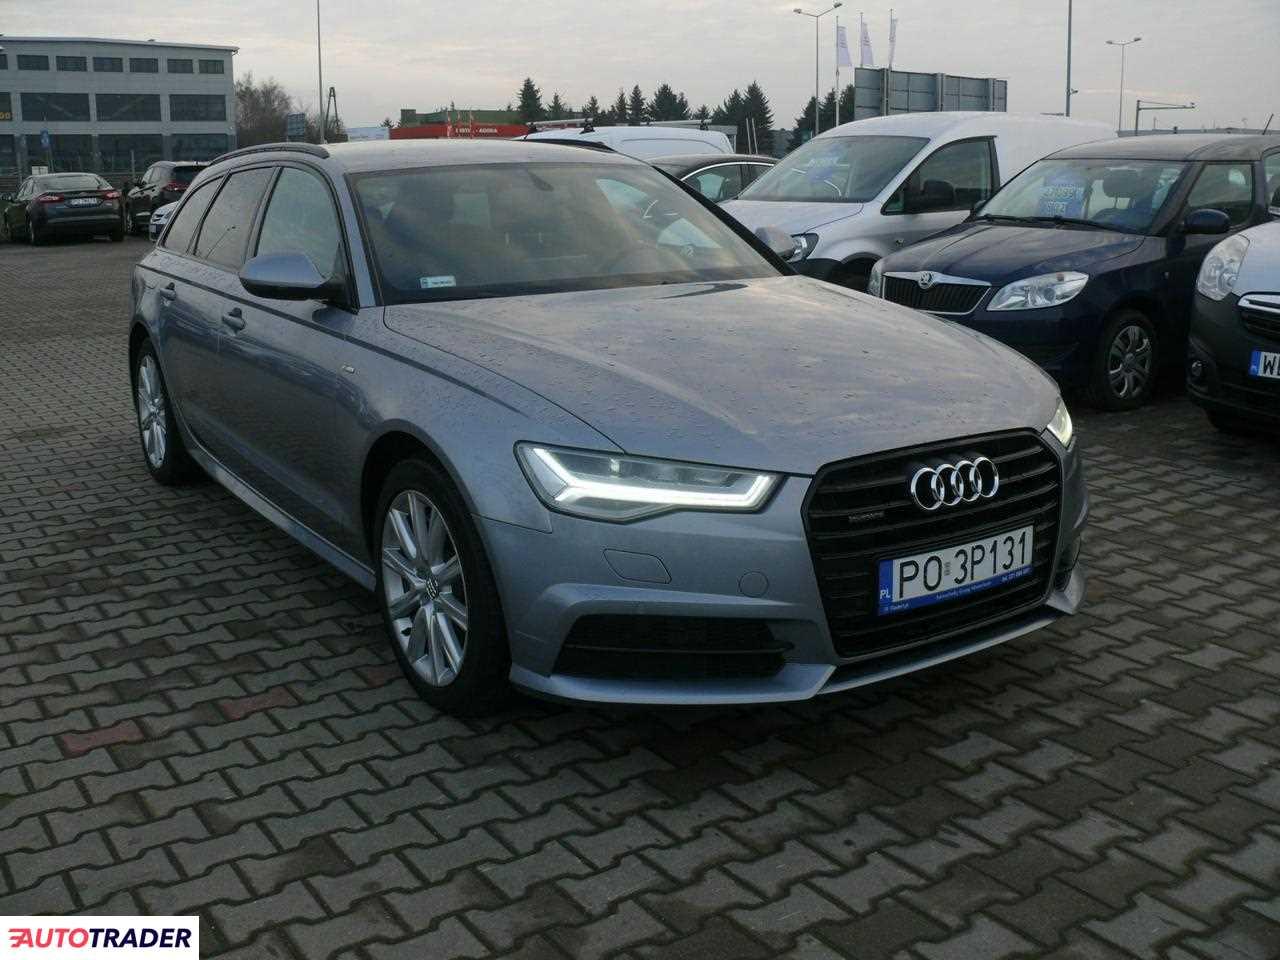 Audi A6 2016 3 218 KM